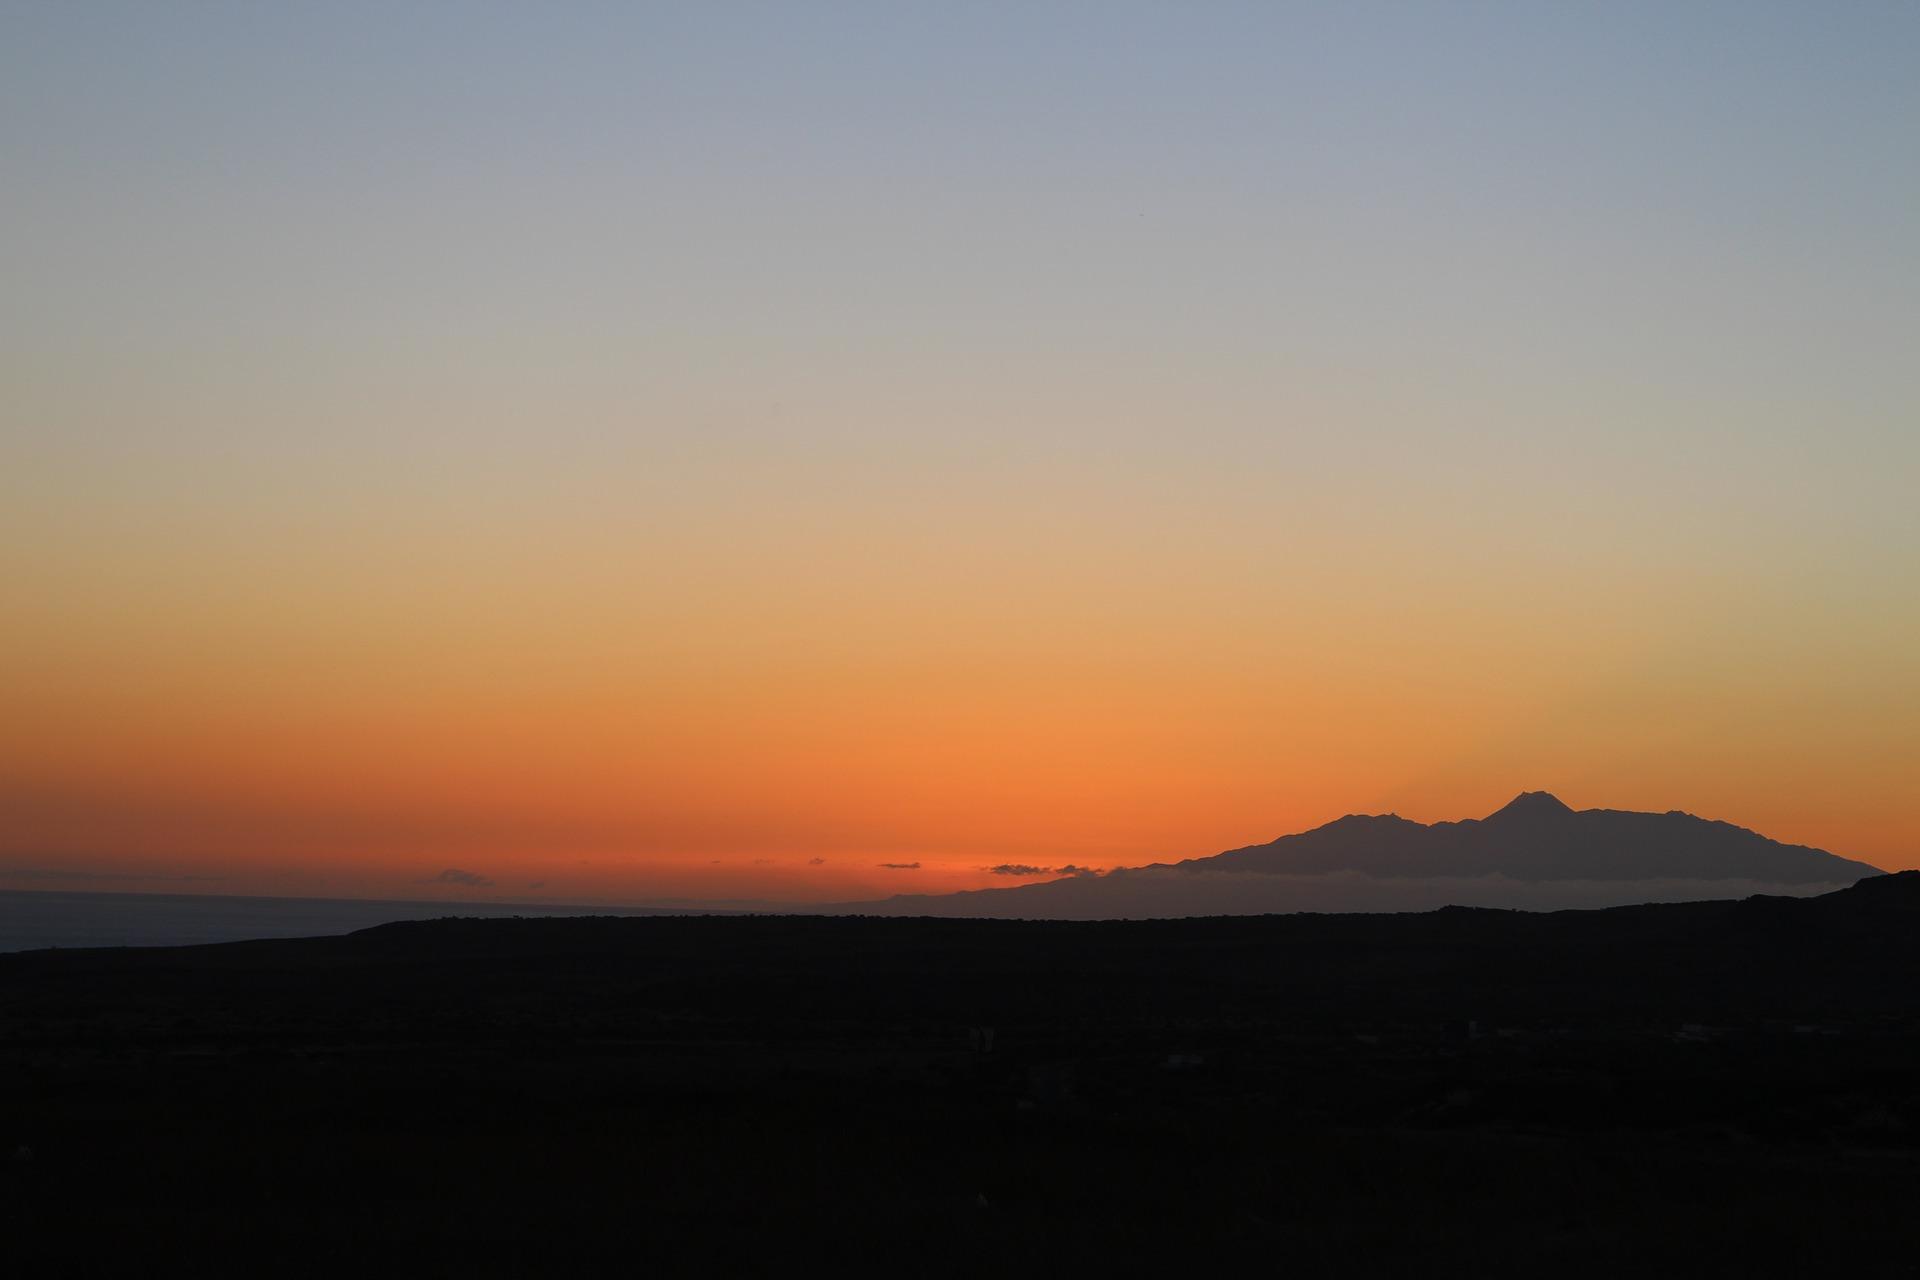 sunset-sky-1251003_1920